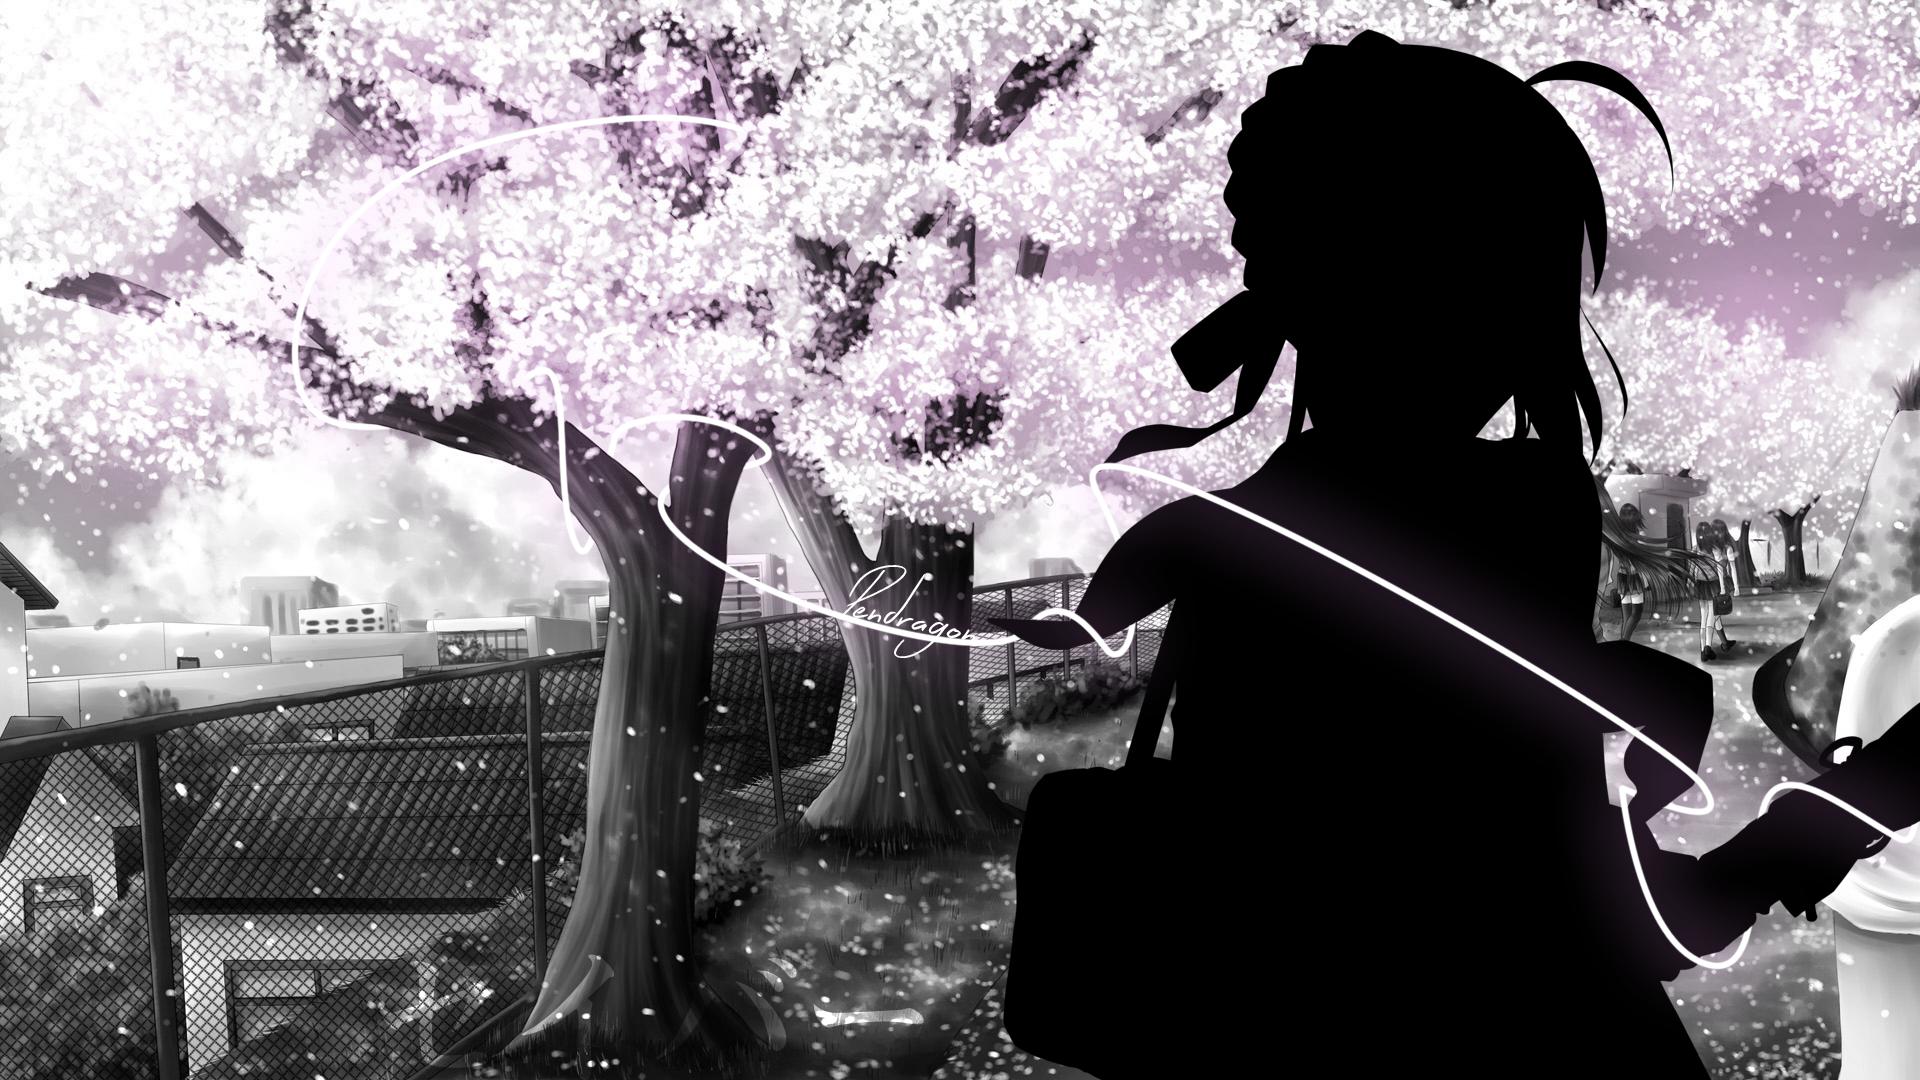 Sakura Tree White Wallpapers ID621496